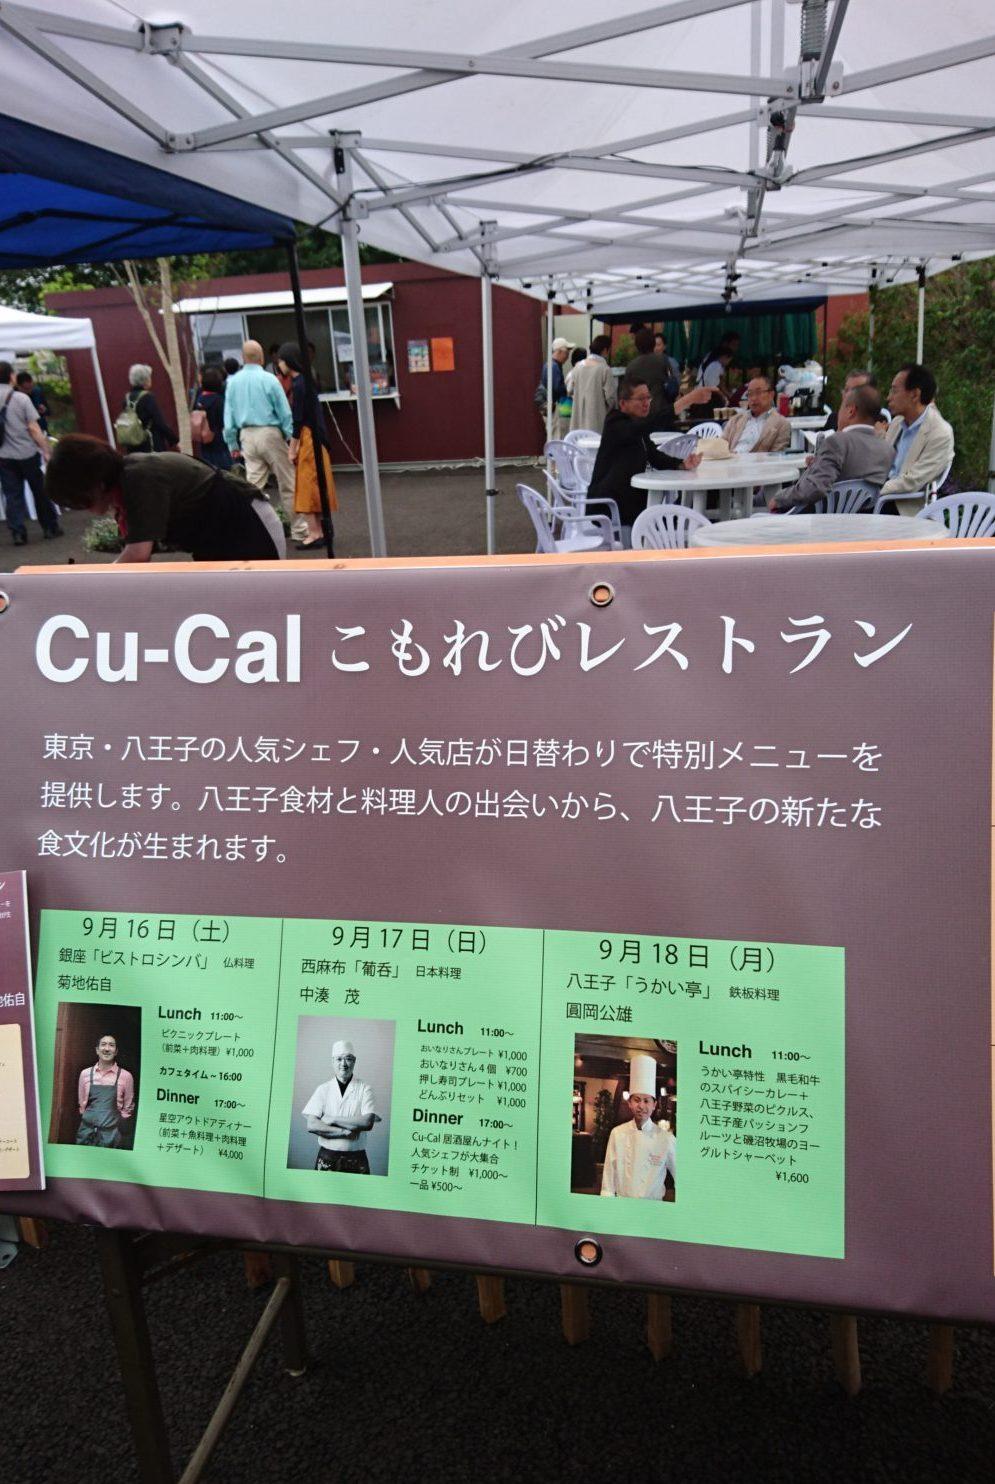 Cu-Calこもれびレストラン